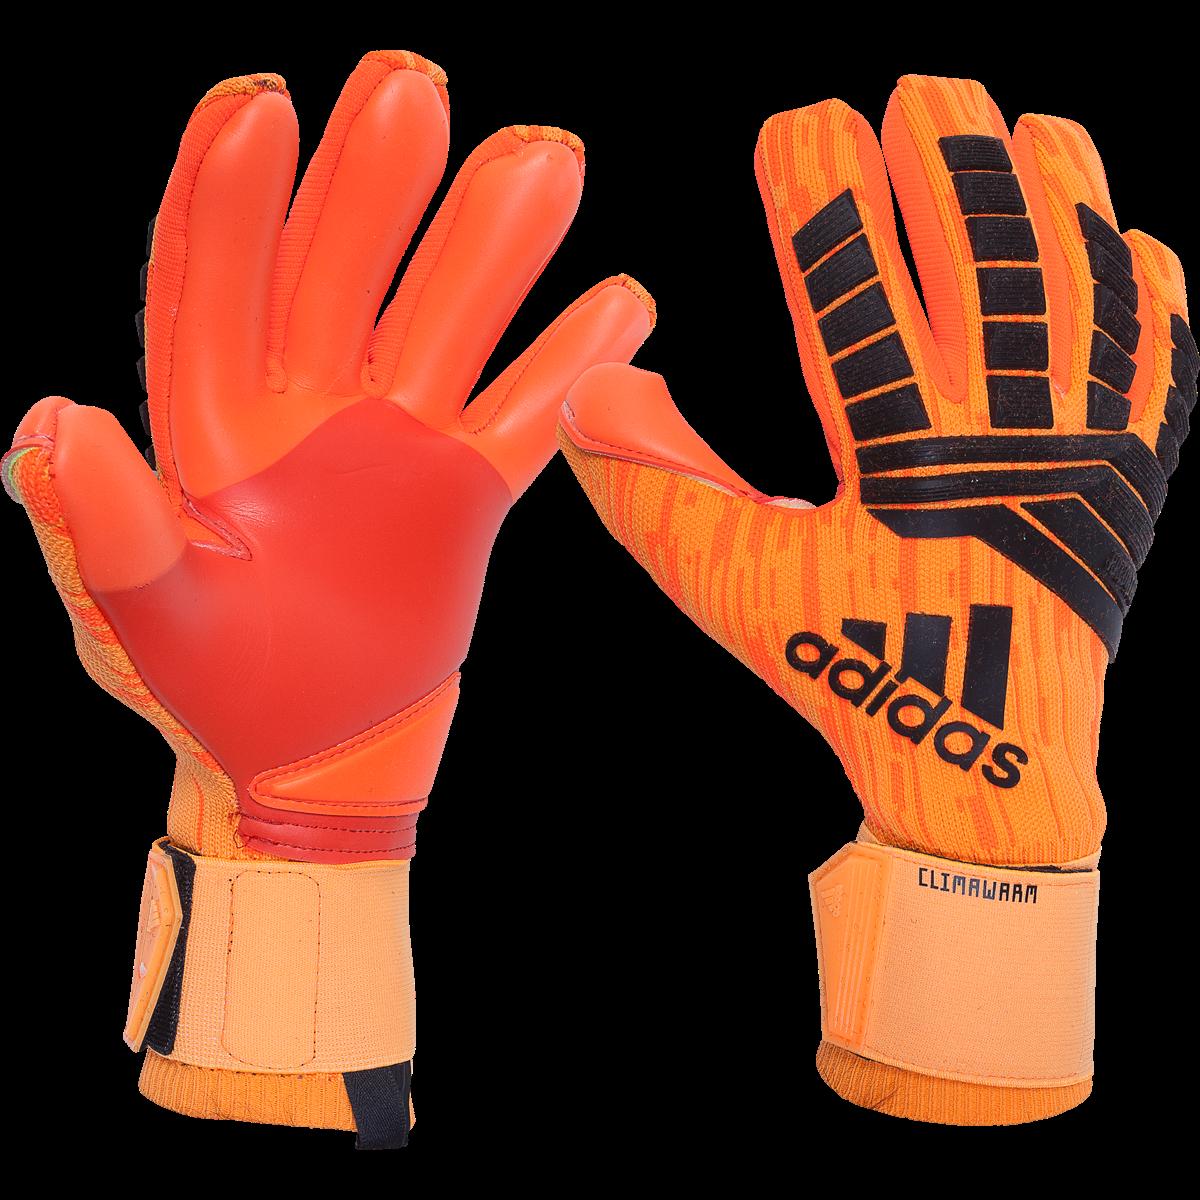 minusválido Fundador Predecesor  adidas Predator Climawarm Goalkeeper Glove-11 | Goalkeeper gloves, Adidas  predator, Goalkeeper